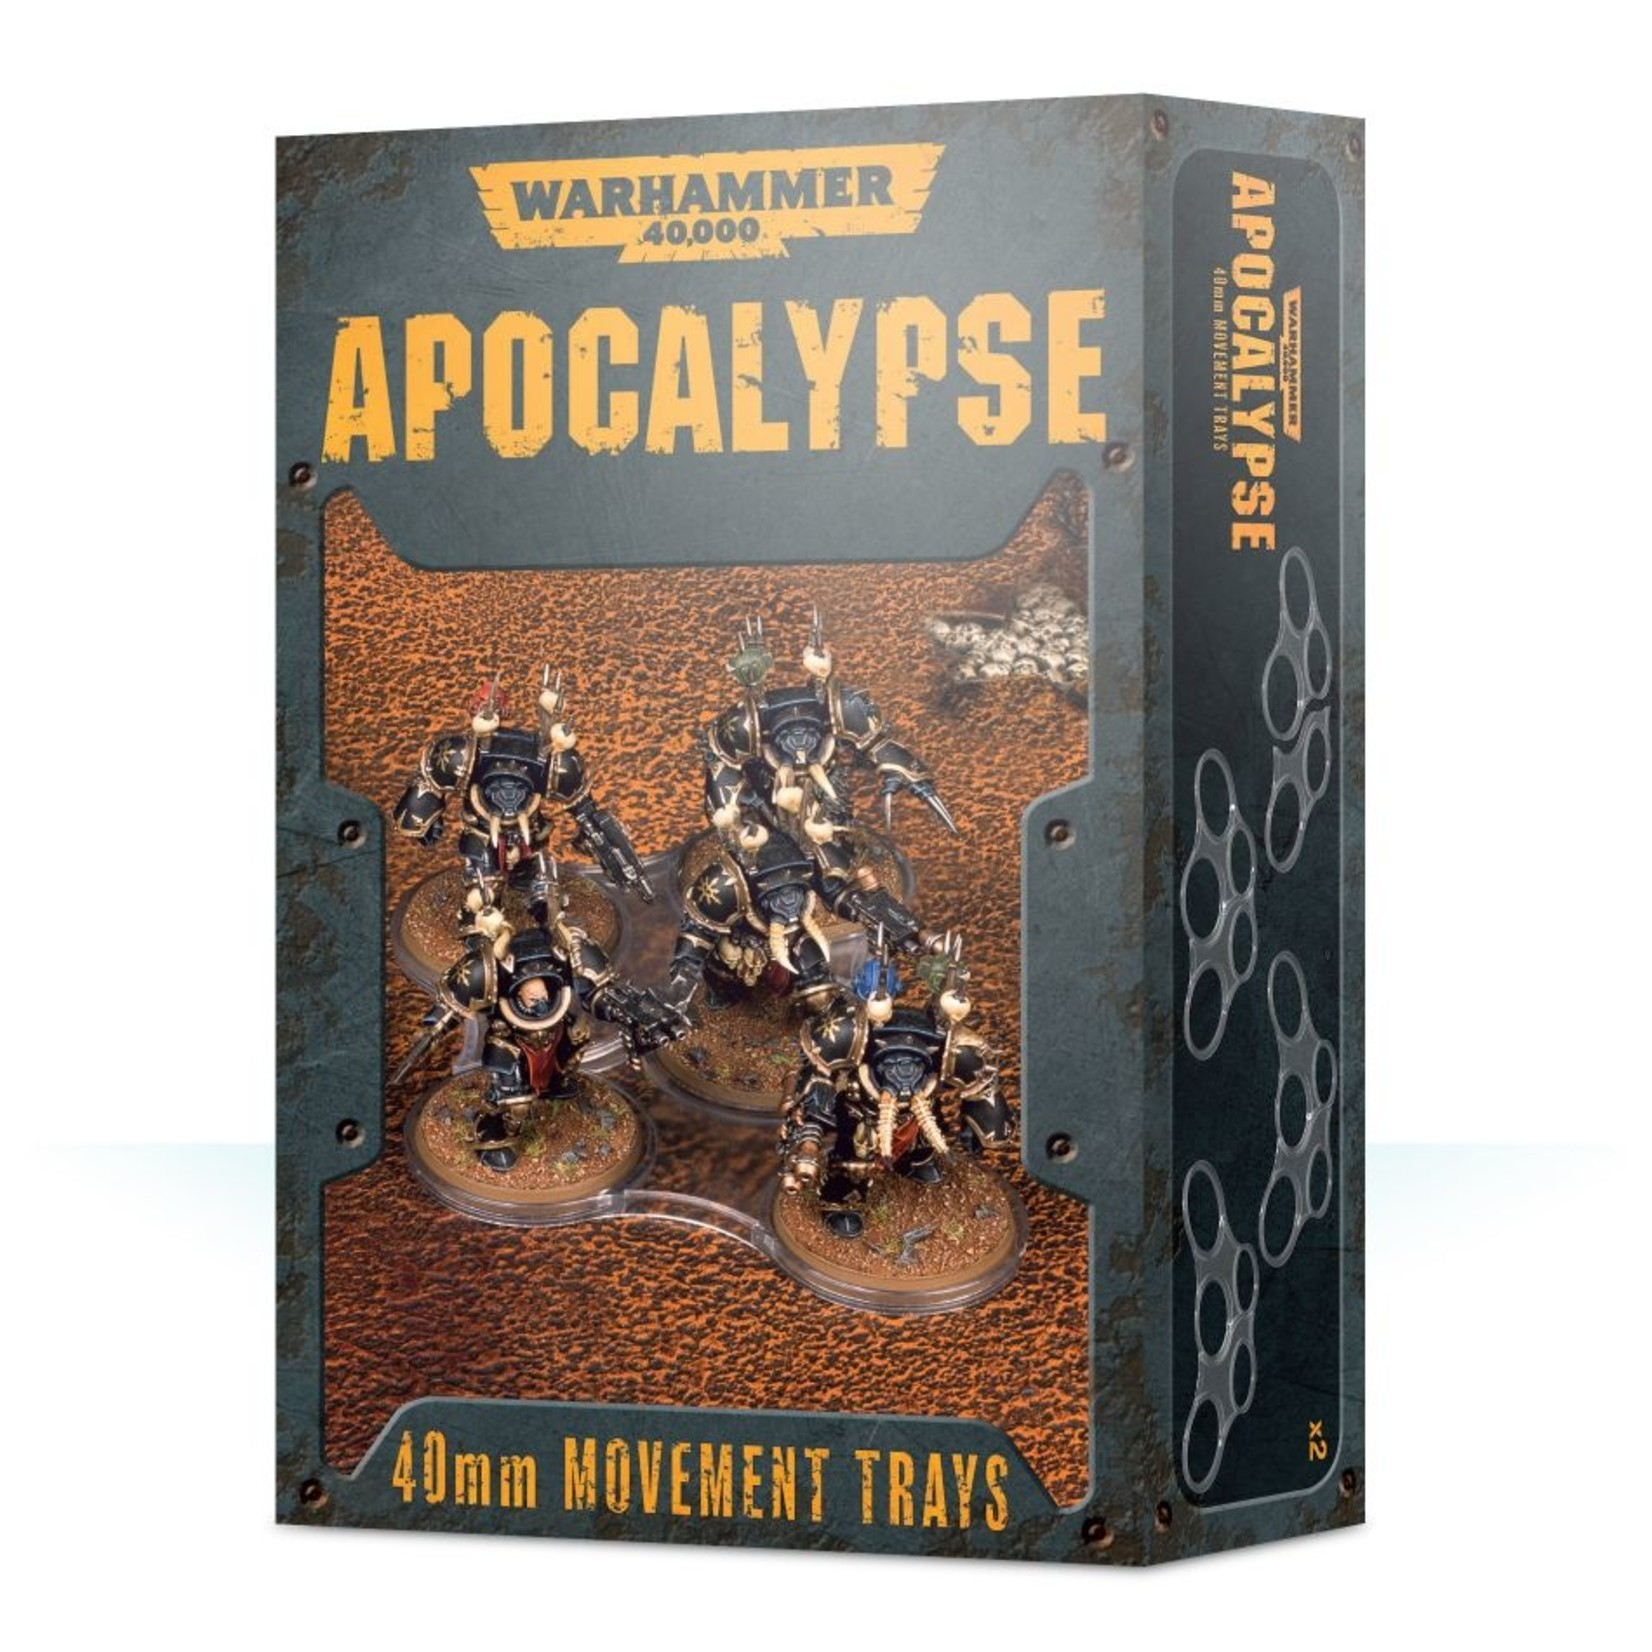 Games Workshop Apocalypse 40mm Movement Trays